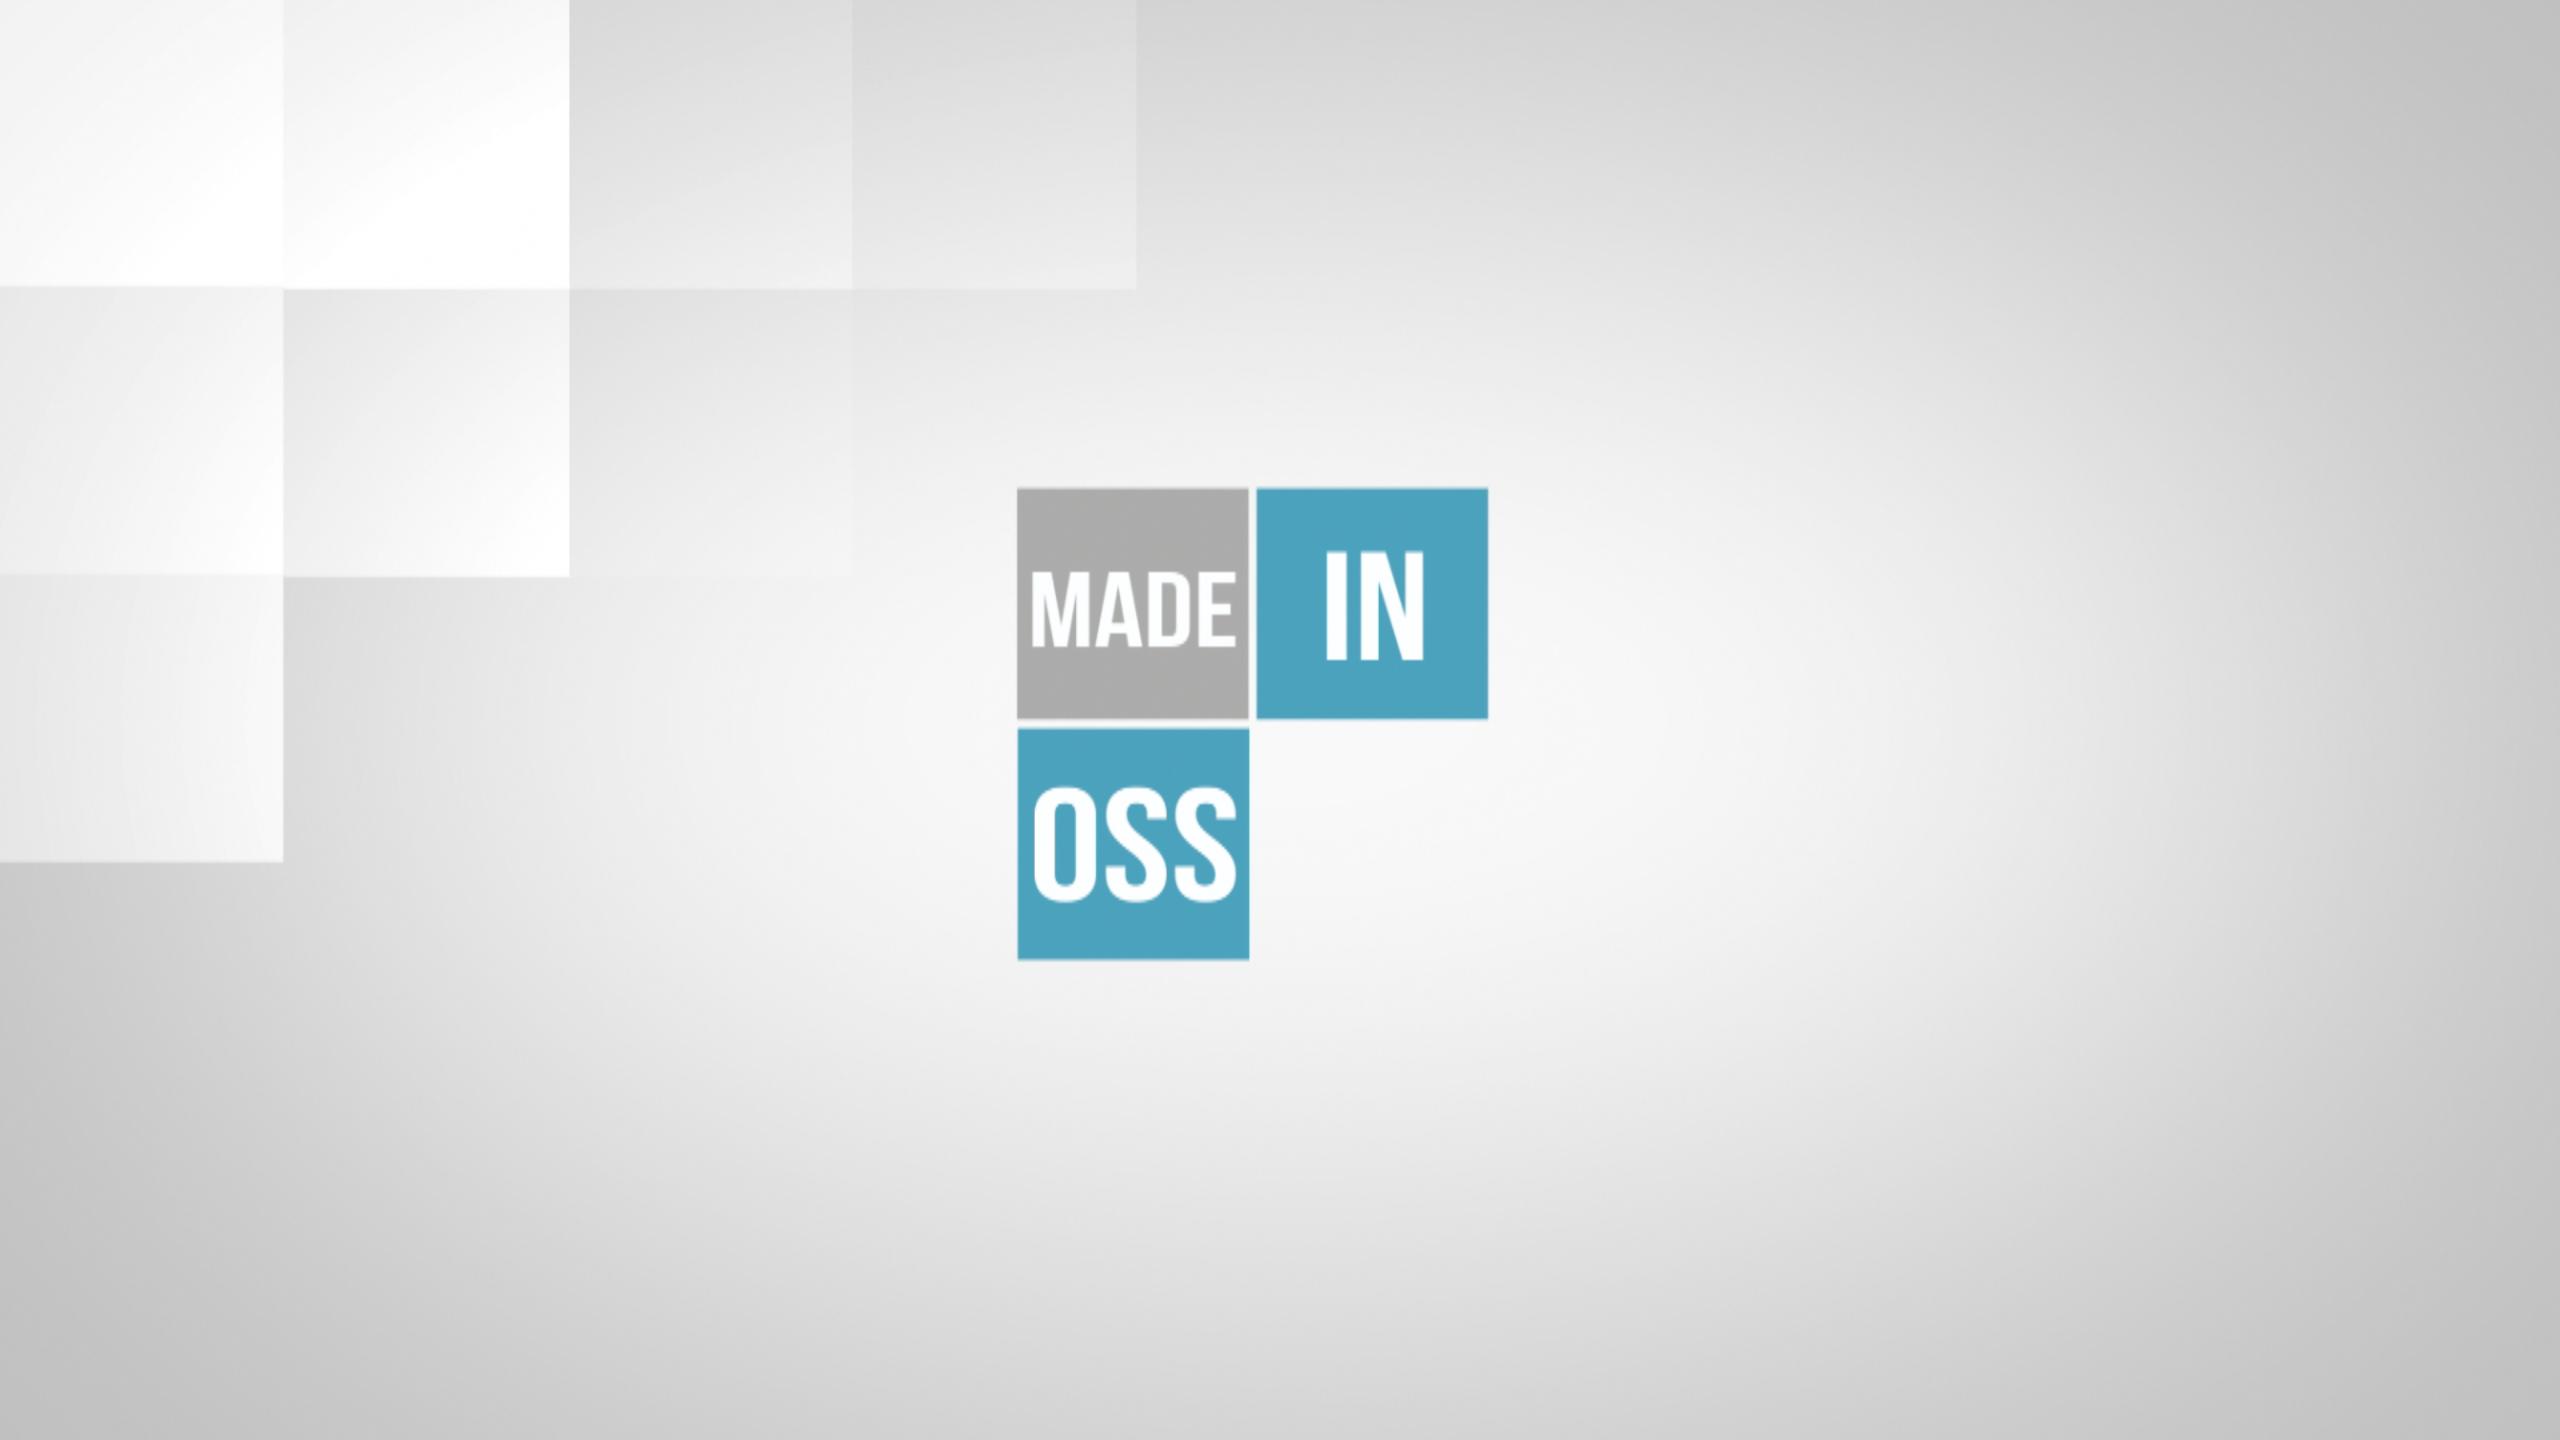 Made in Oss | Bernheze